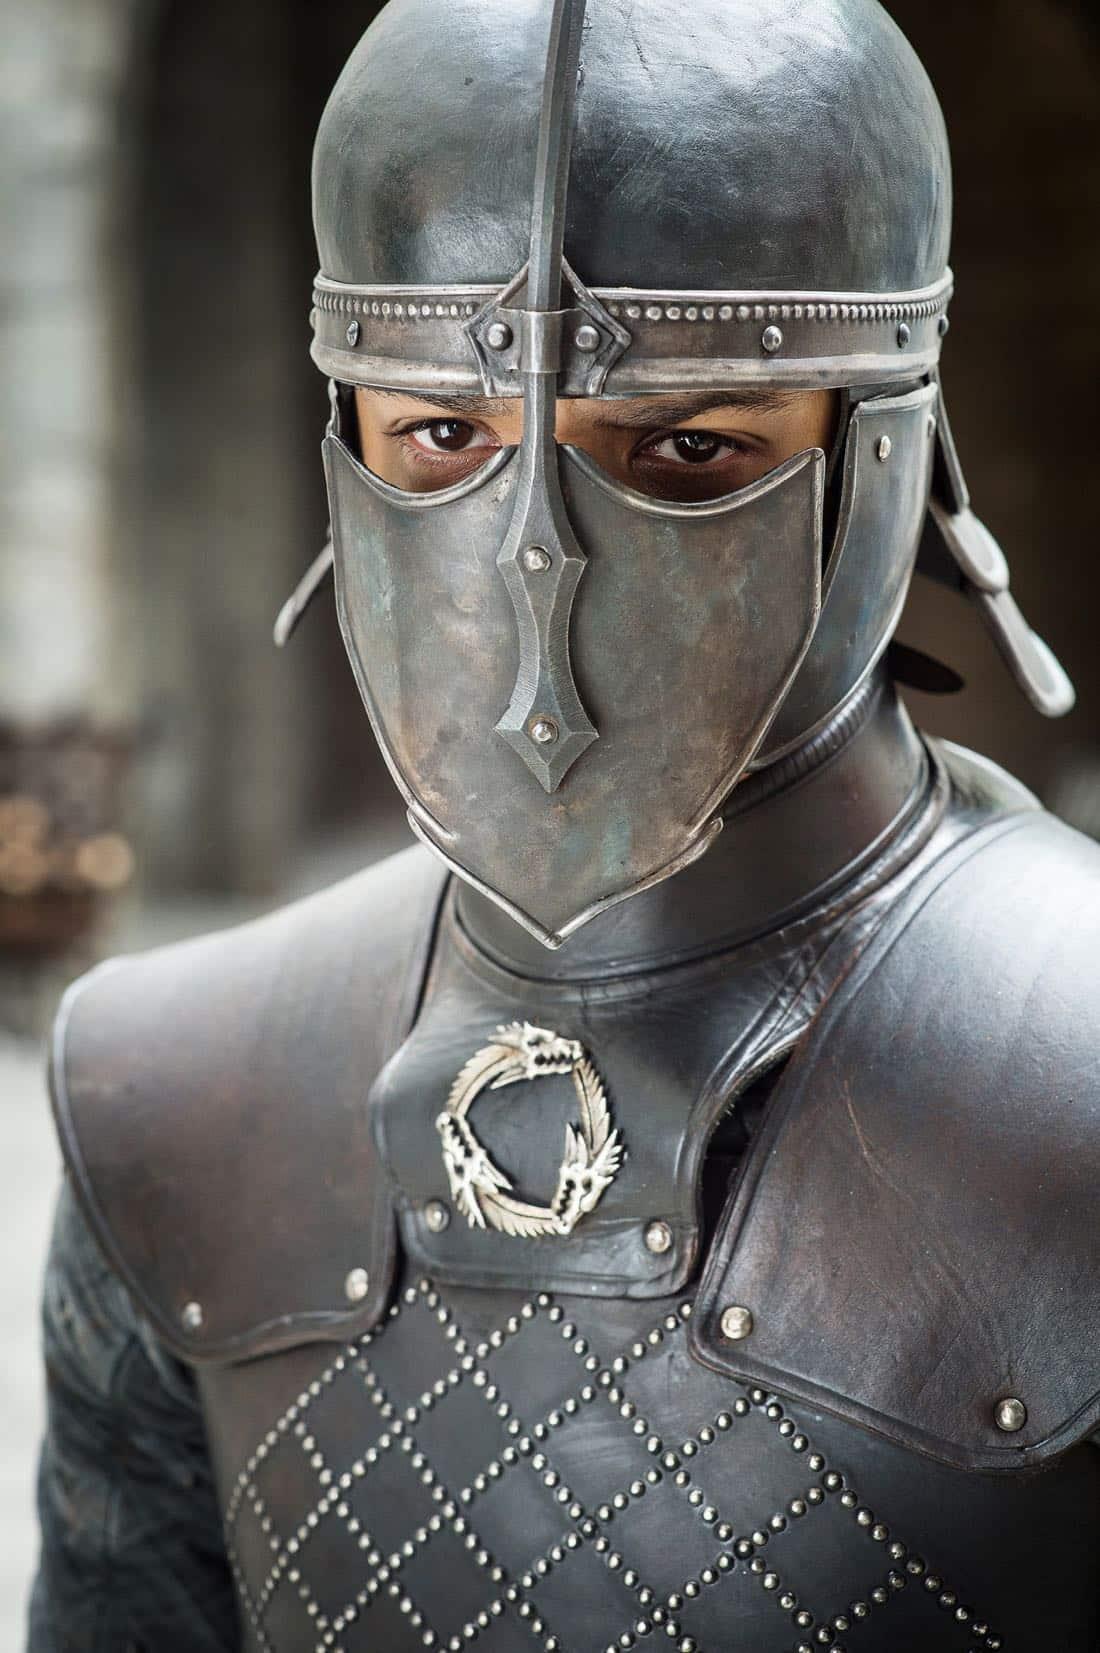 Episode 63 (season 7, episode 3), debut 7/30/17: Jacob Anderson. photo: Helen Sloan/courtesy of HBO